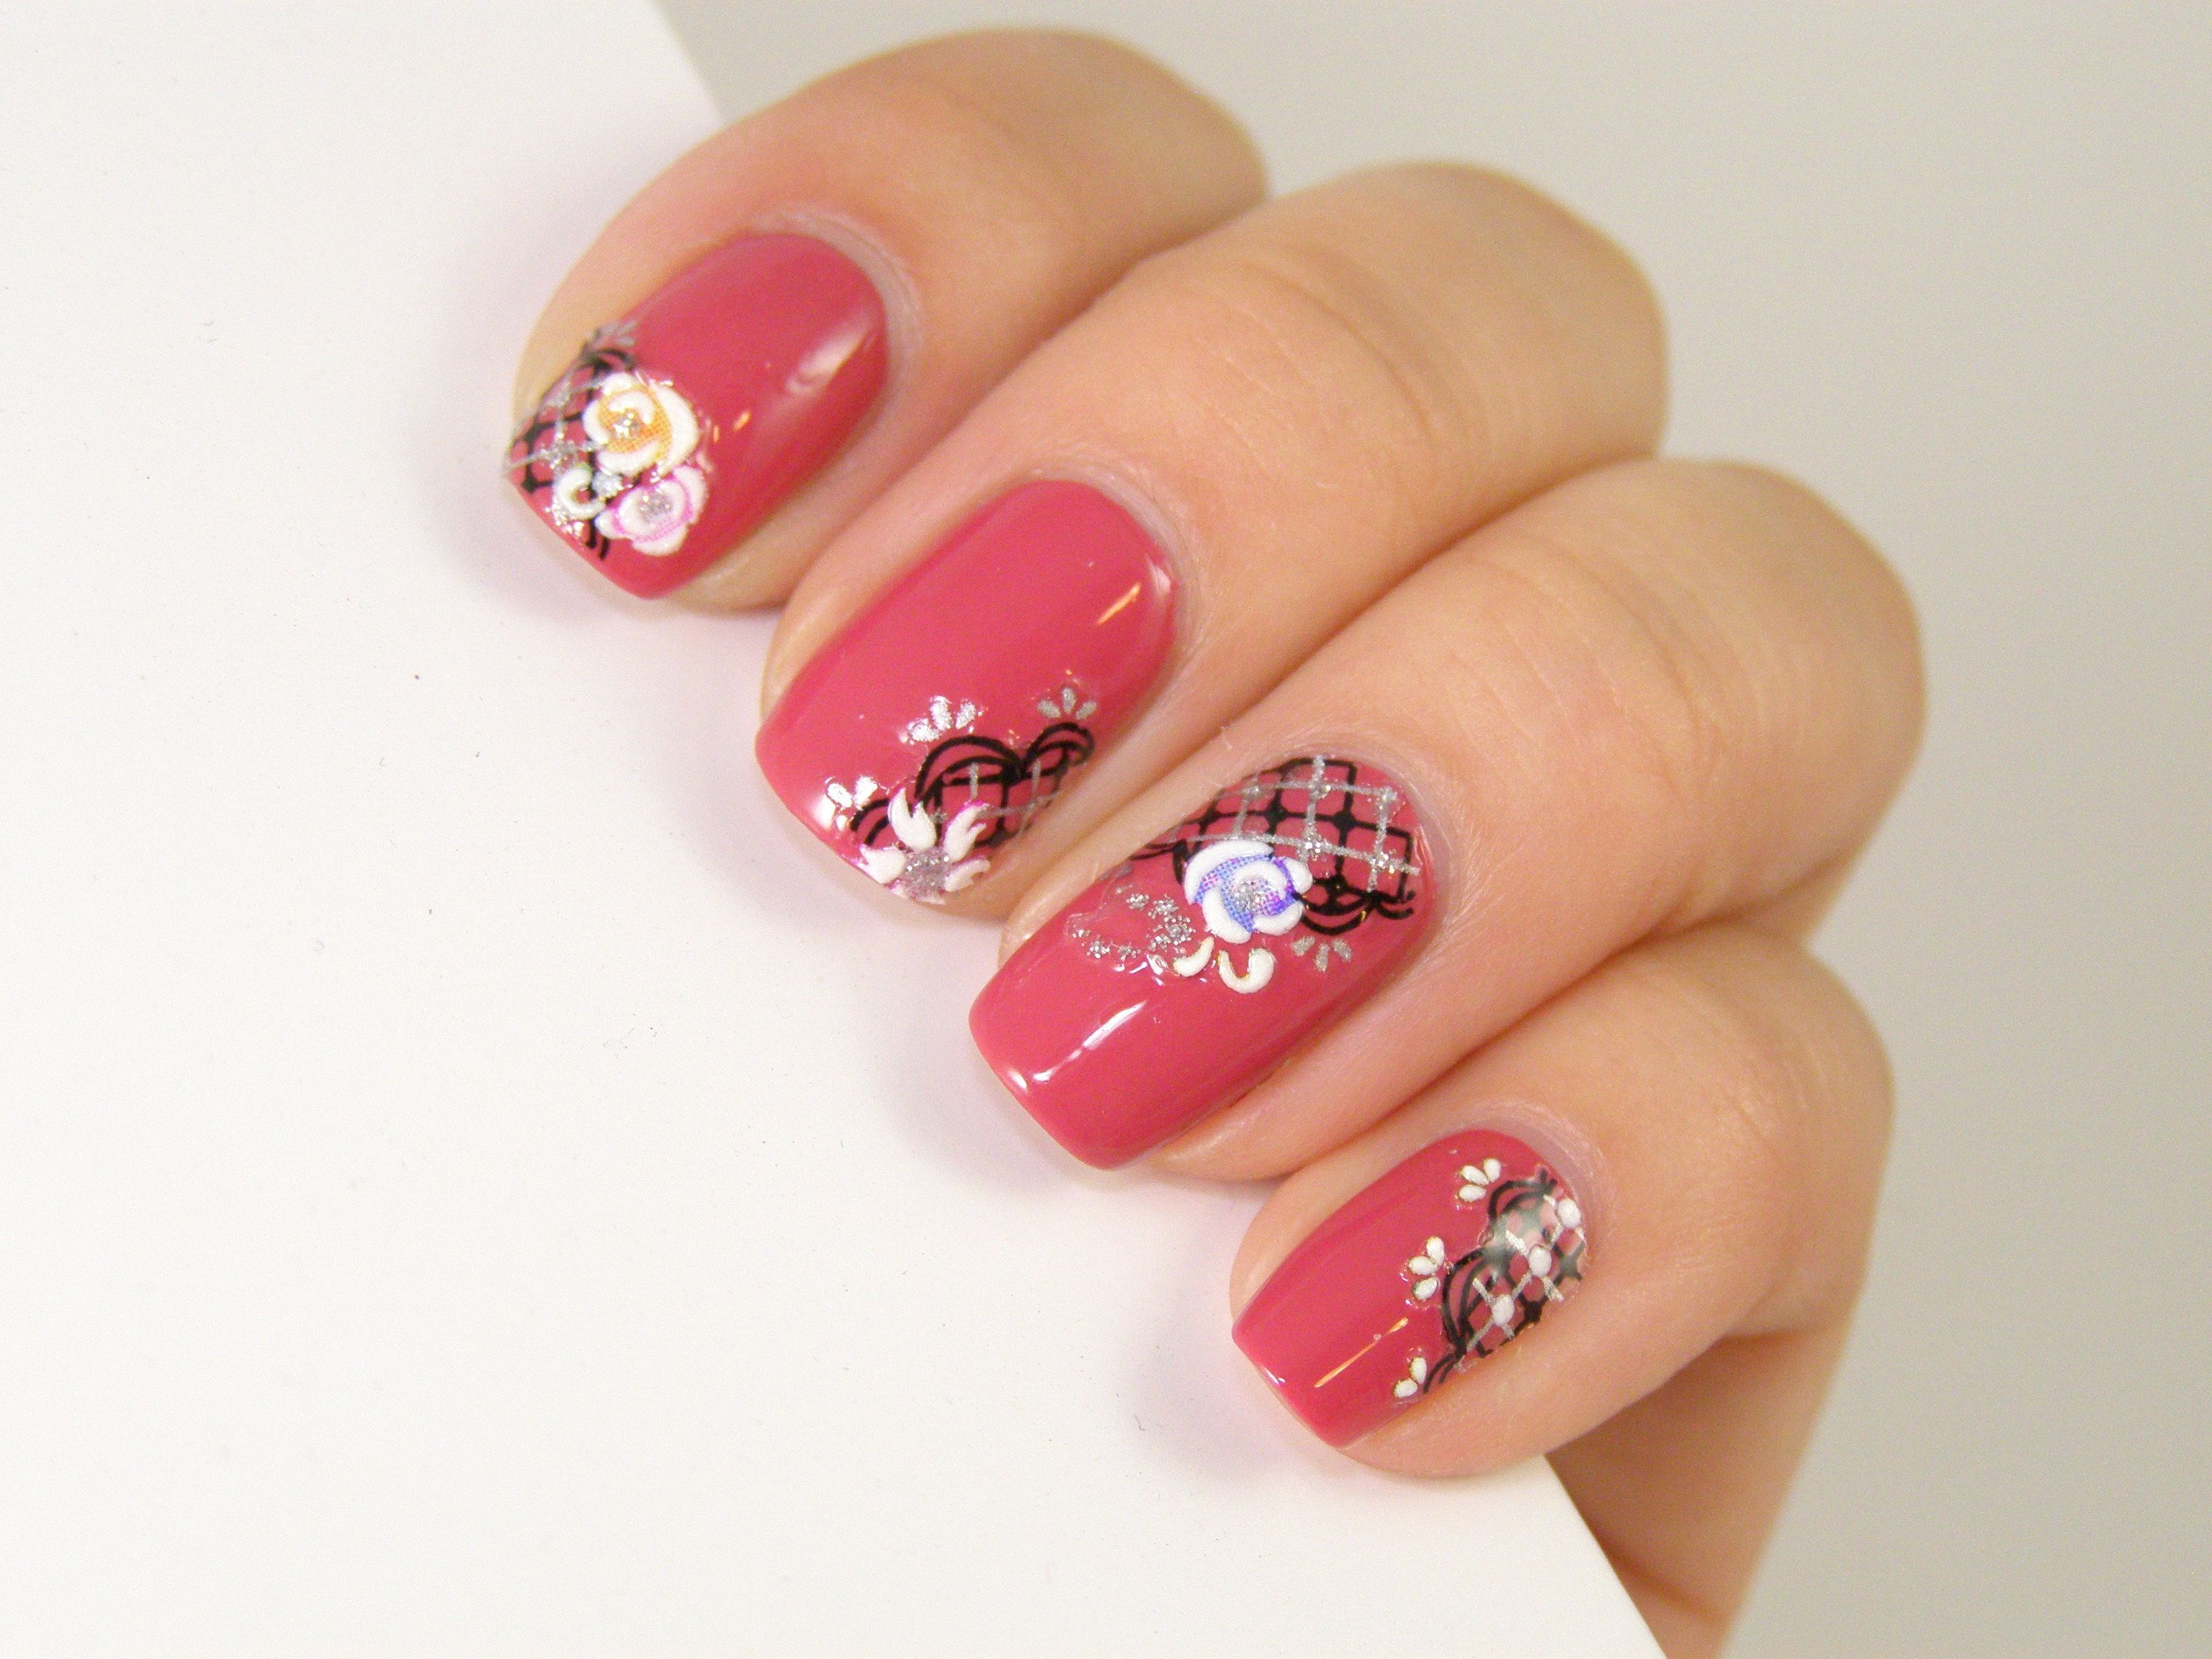 "Foto: Reprodução / <a href=""https://winstoniastore.wordpress.com/2012/06/25/tutorial-nail-art-using-deco-nail-stickers/"" target=""_blank"">Winstonia</a>"